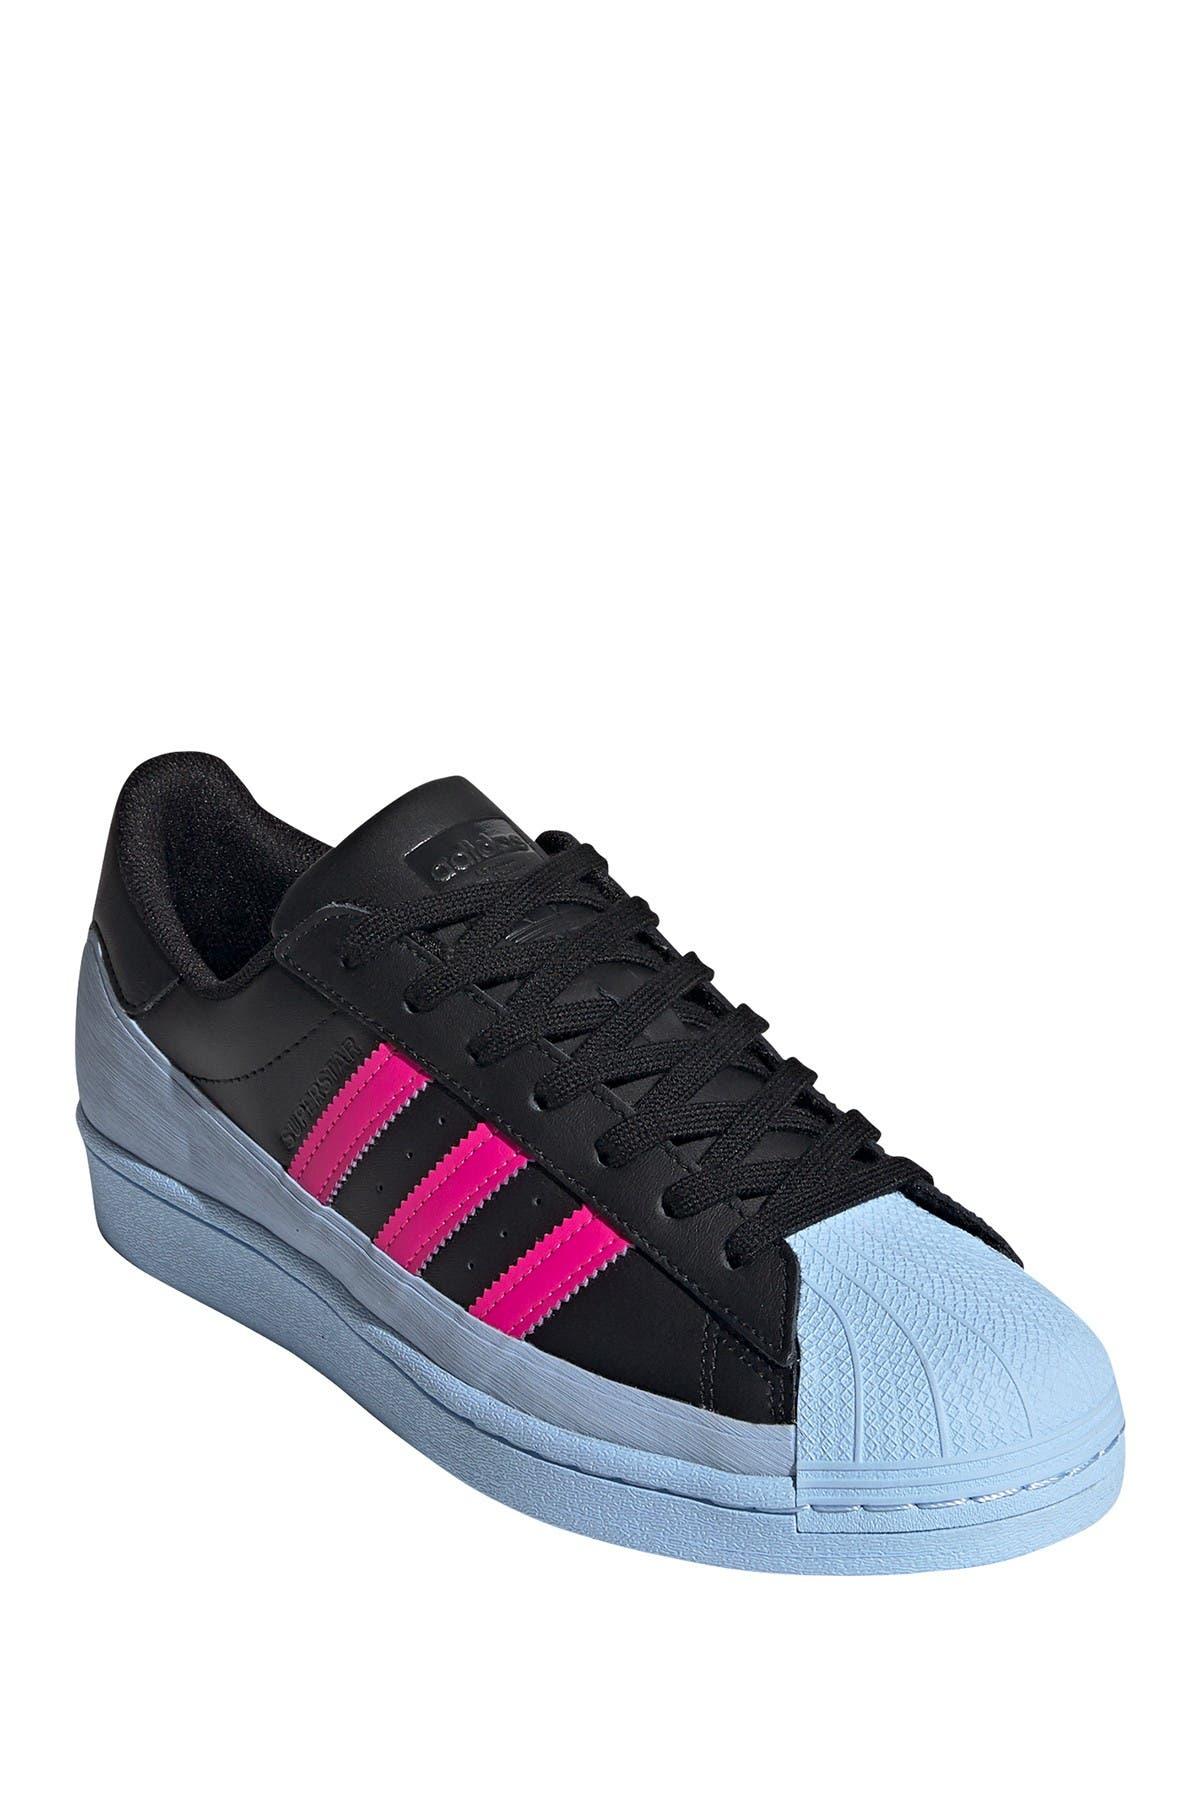 Image of adidas Superstar MG Sneaker